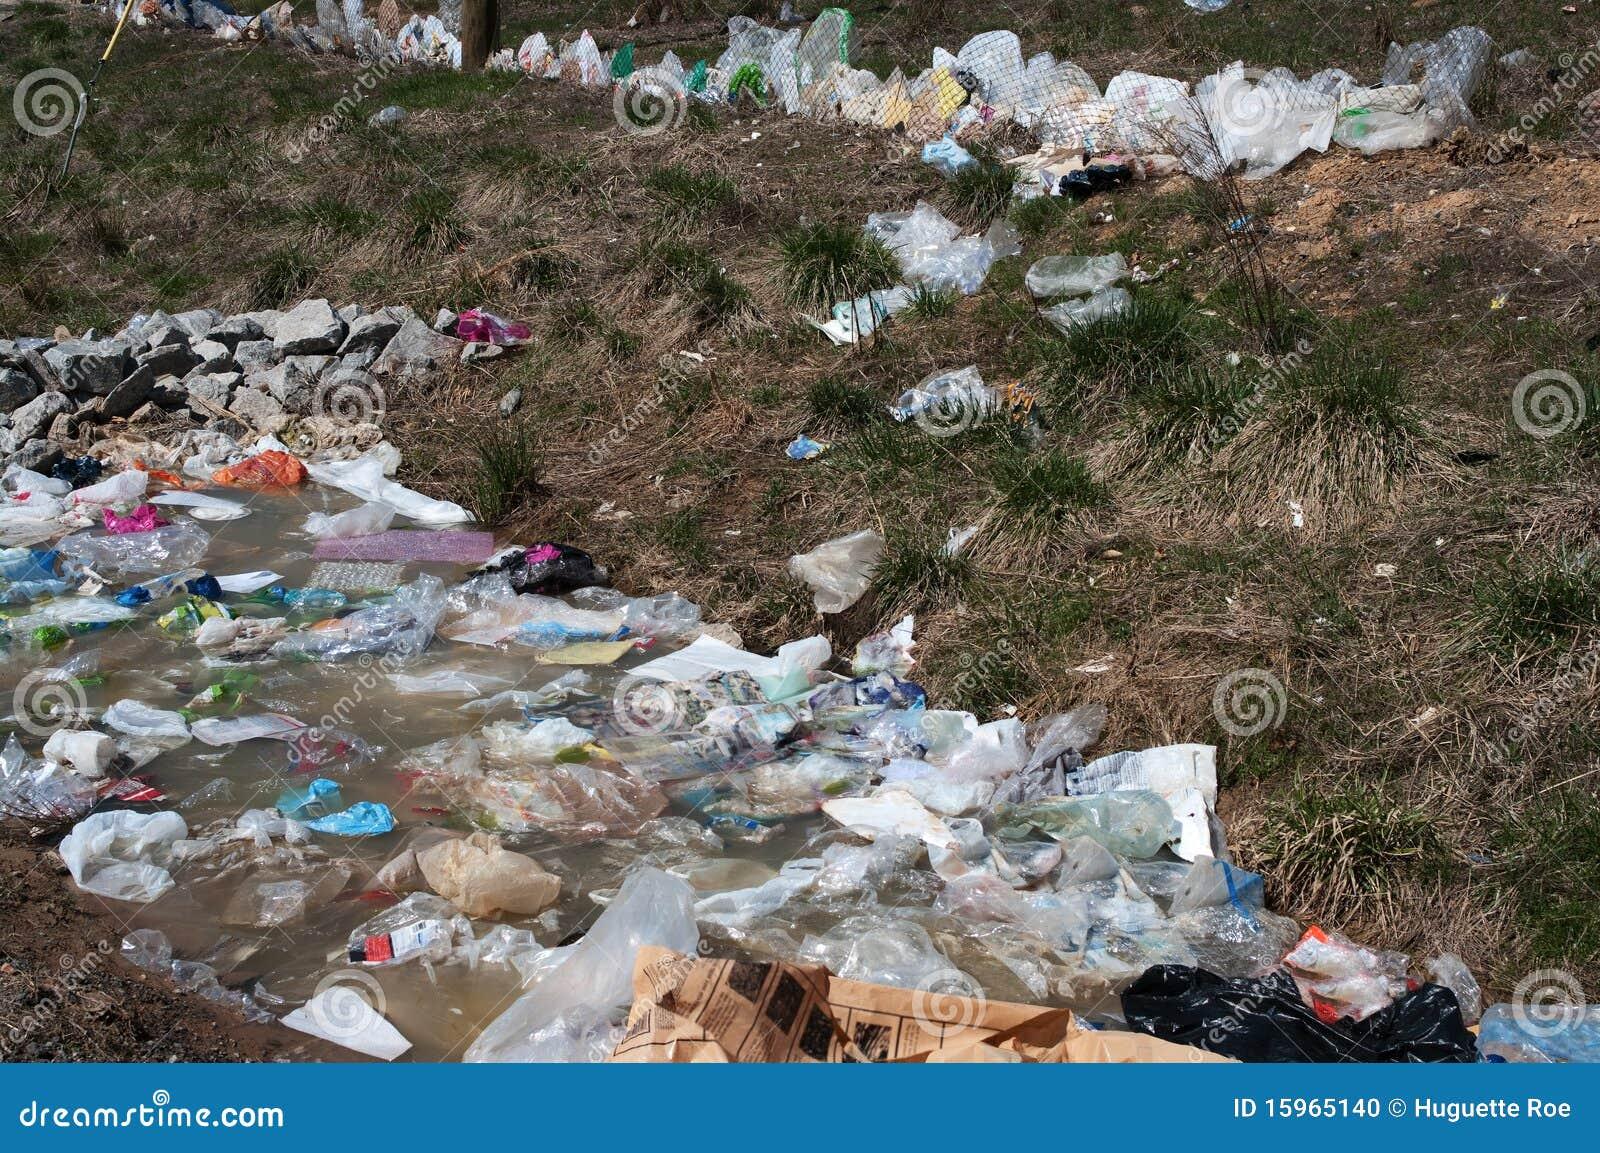 Plastic bag pollution stock photo. Image of damage, refuse ...